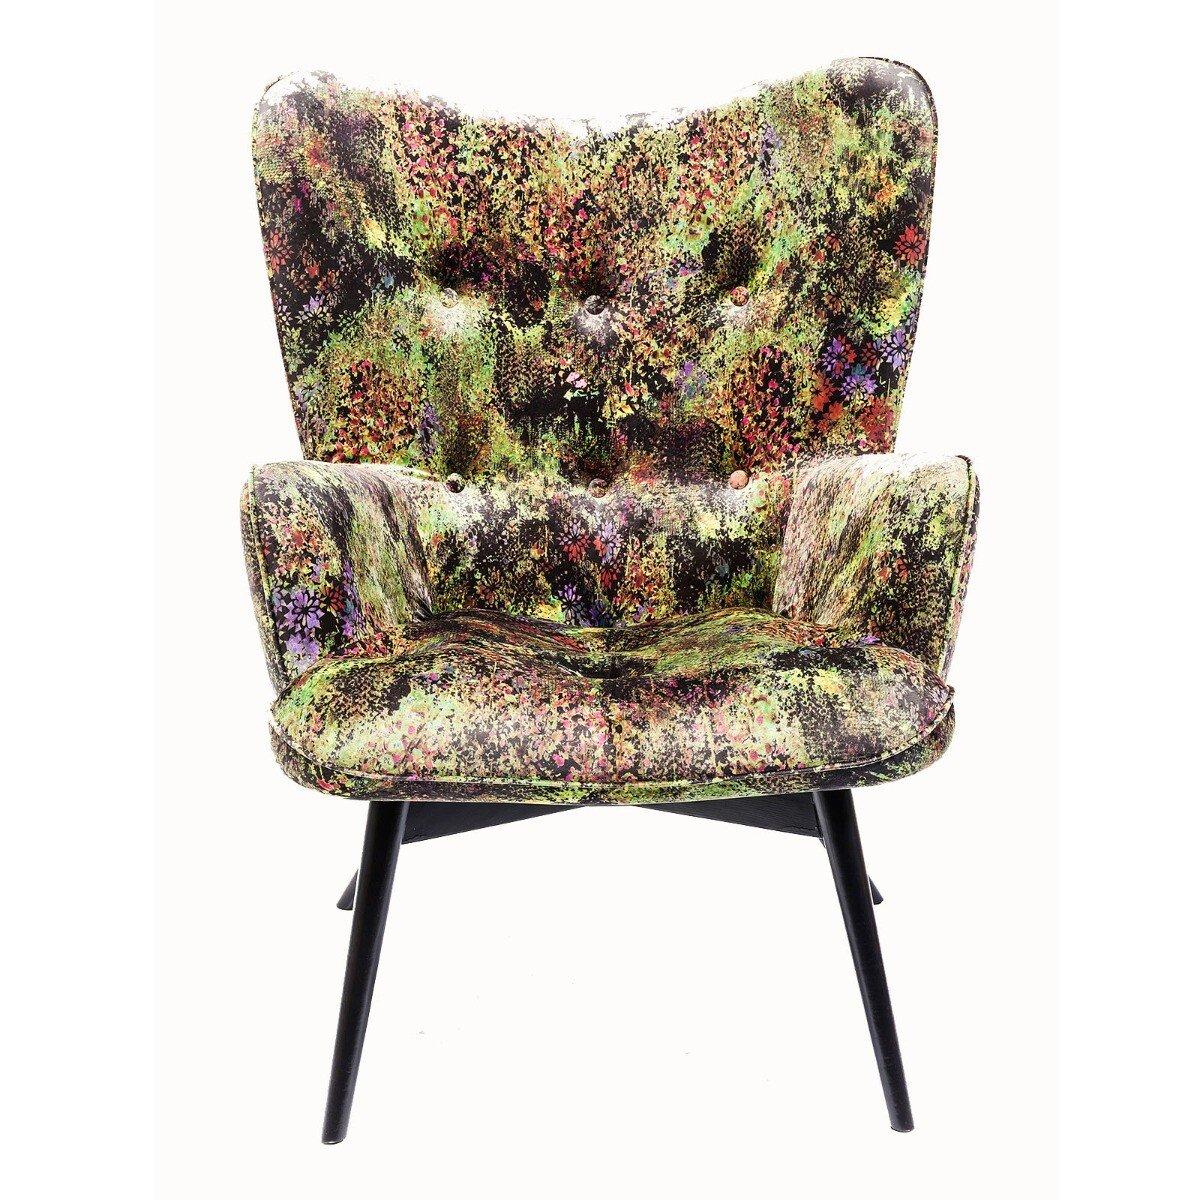 Kare Design fauteuil black vicky groen 92 x 59 x 63